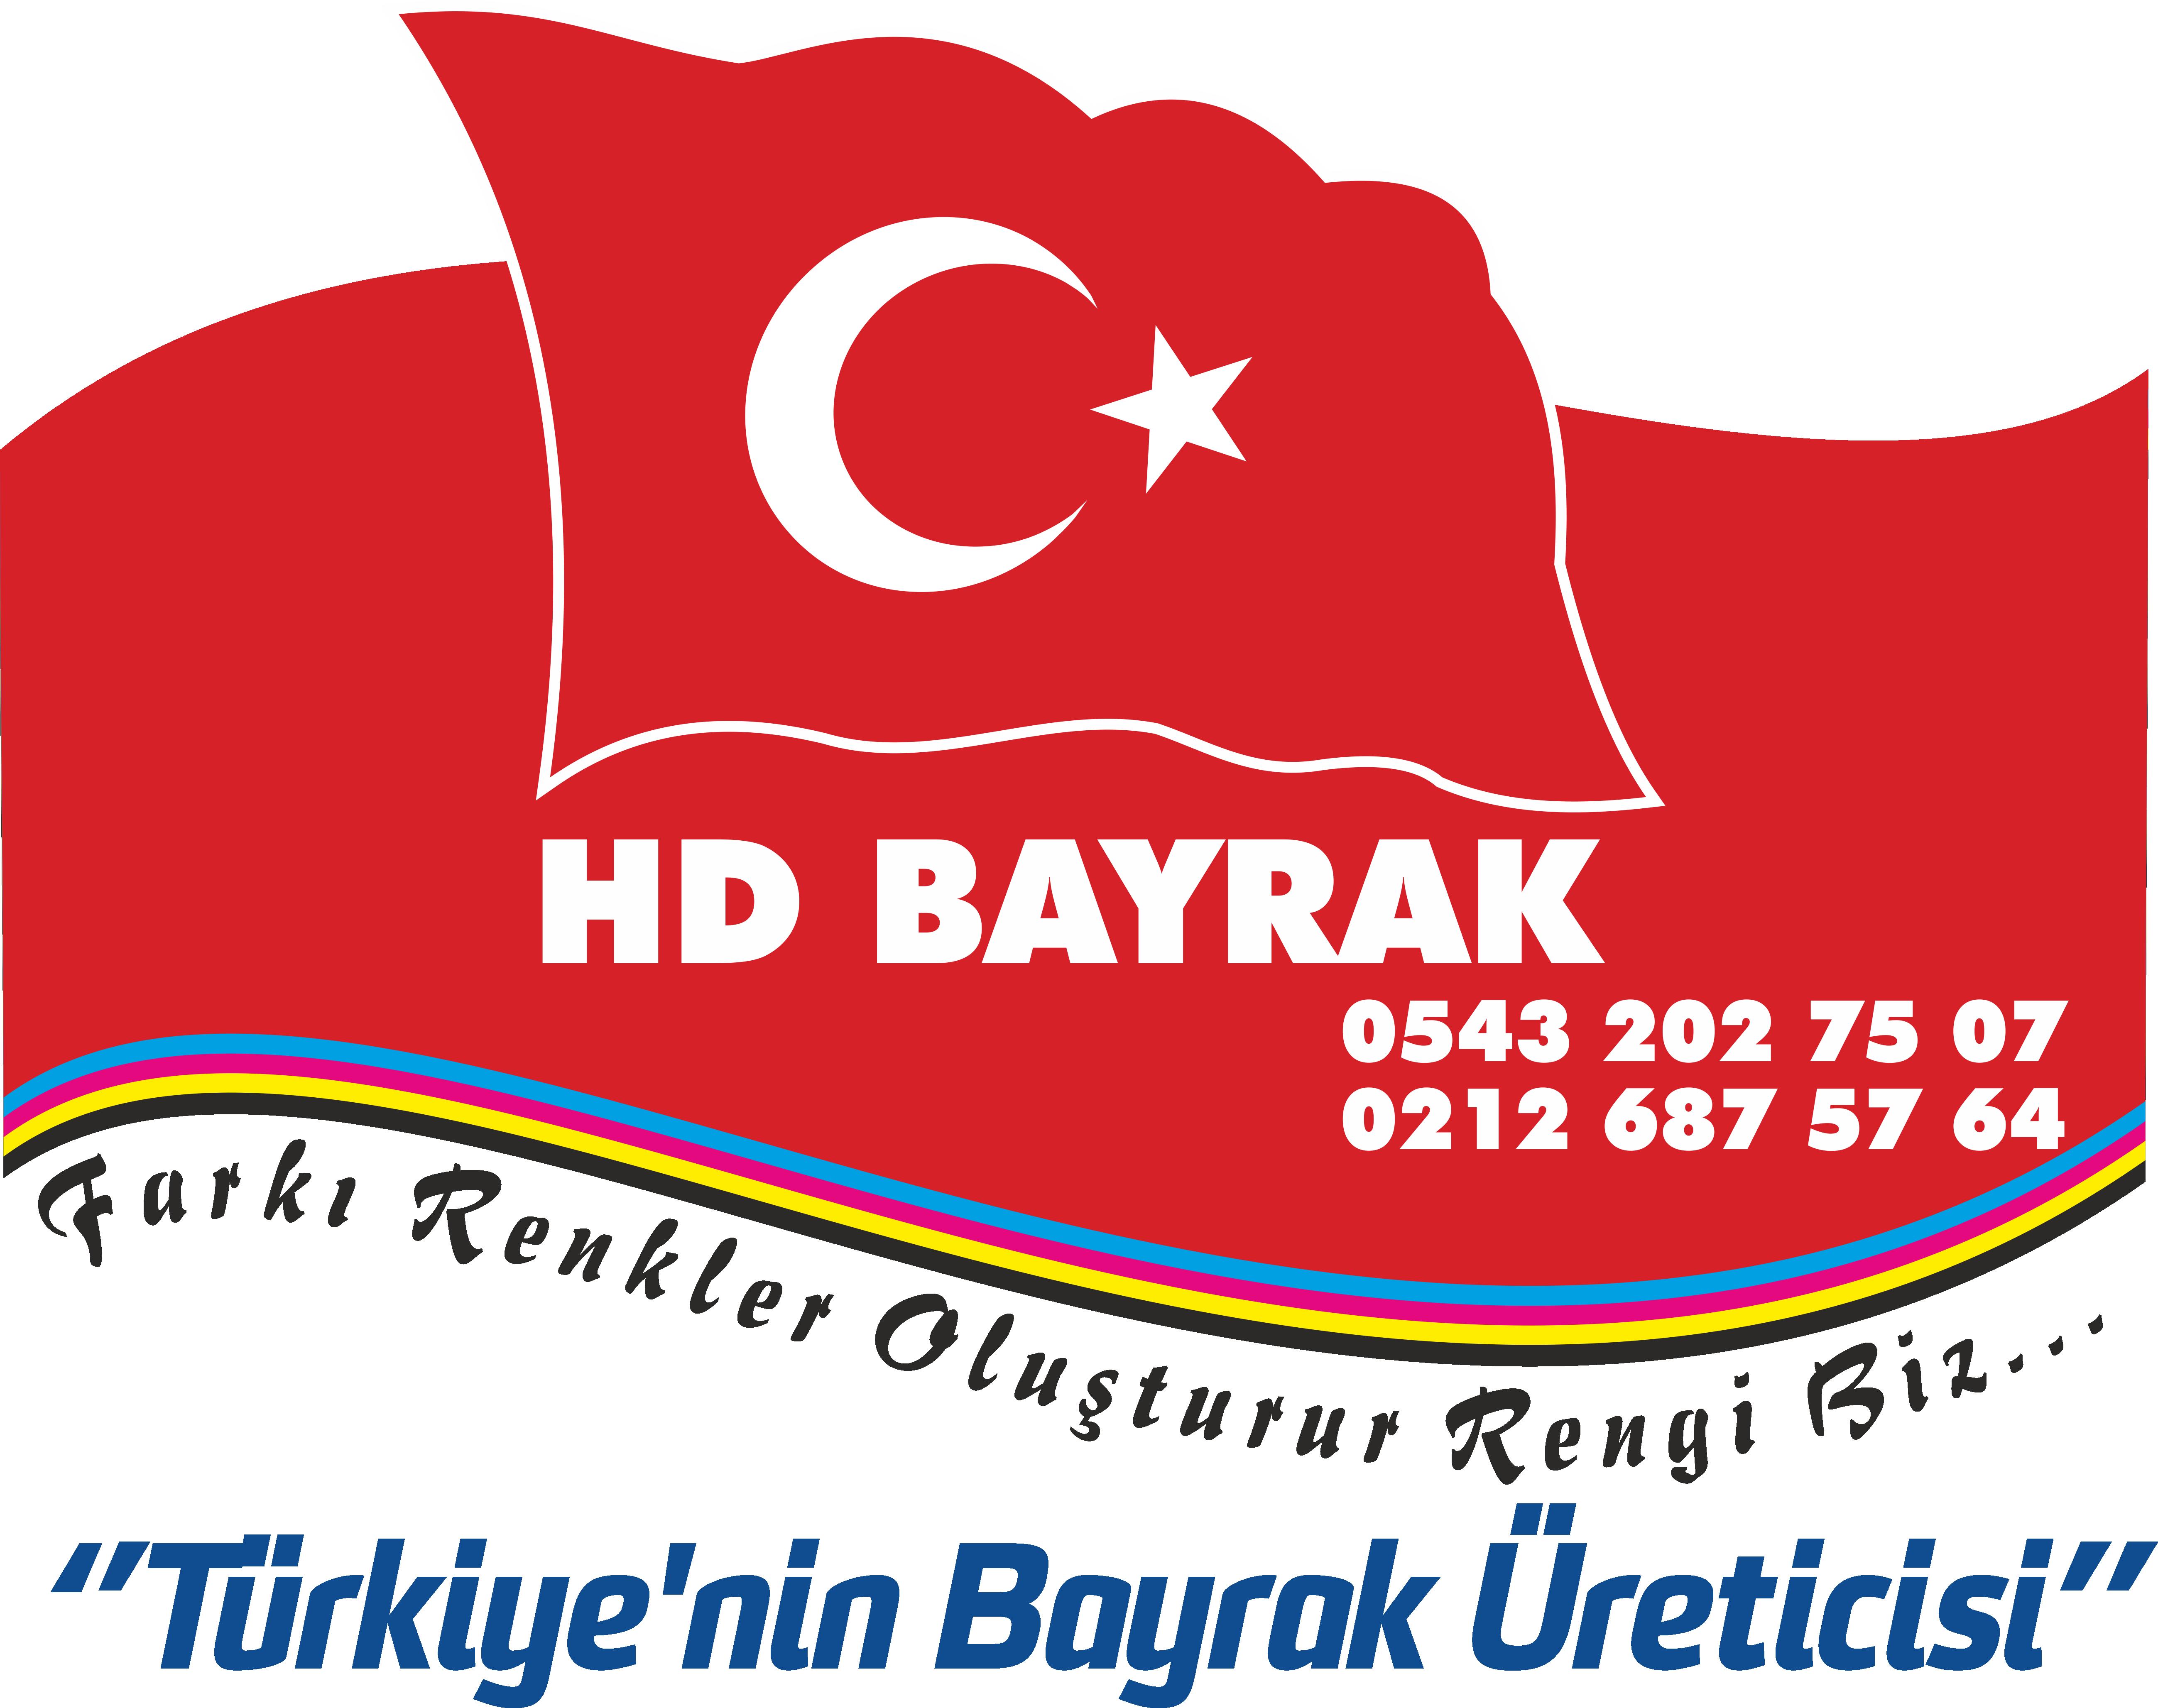 HD Bayrak